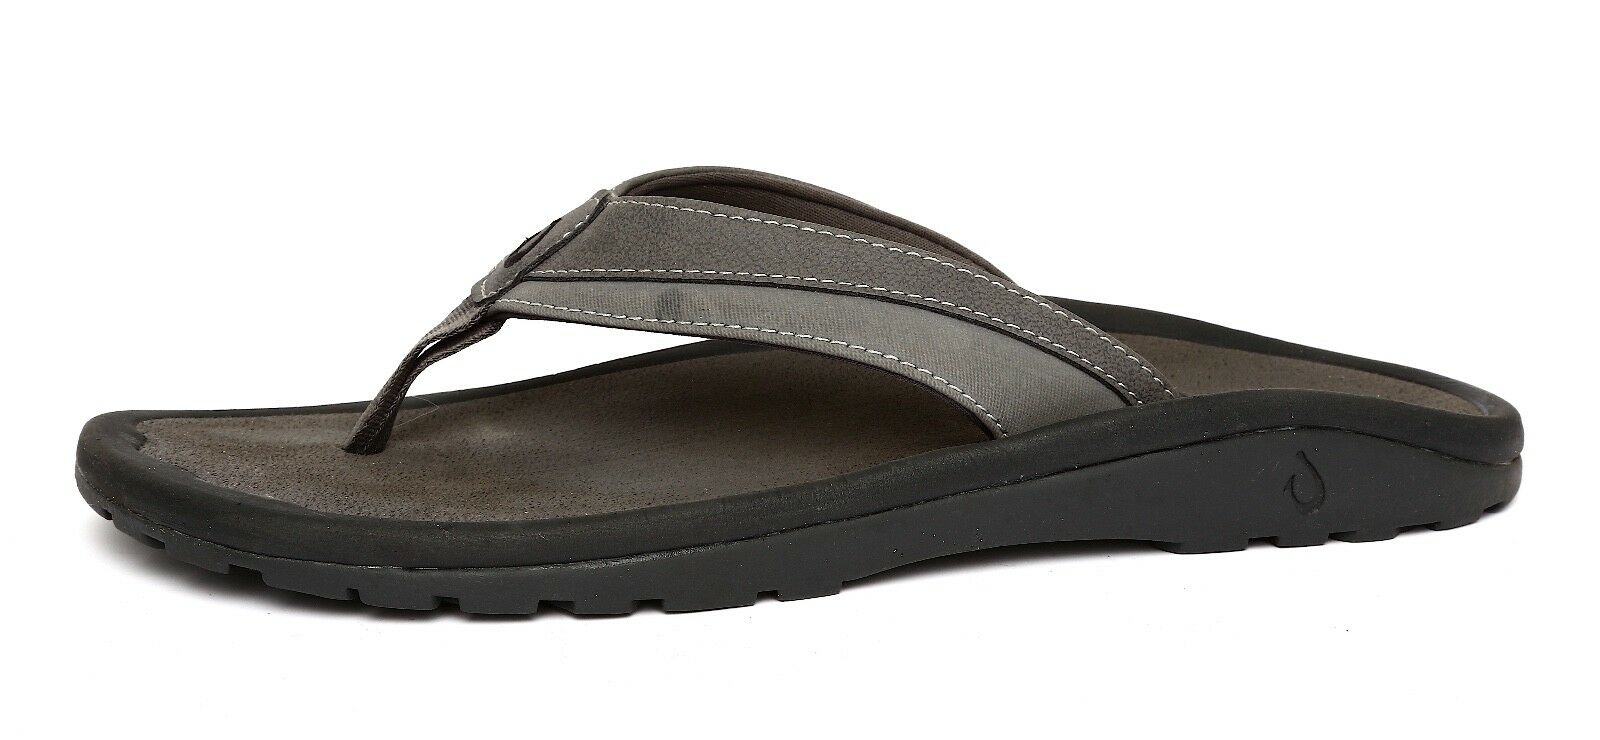 Olukai Ohana Men's Grey Sandal Sz 11M 9746